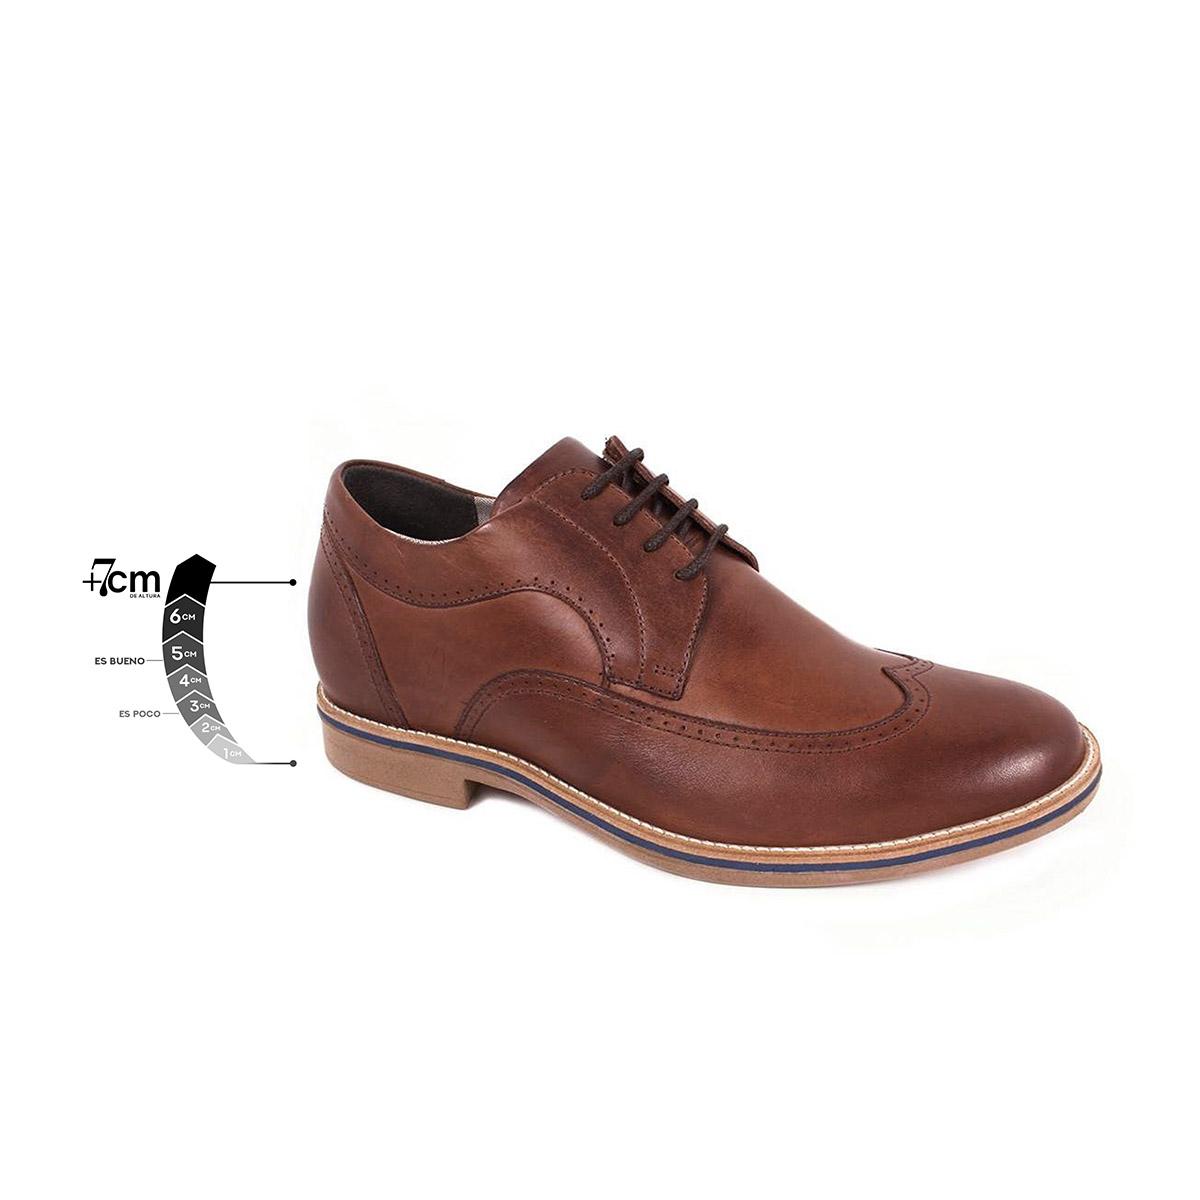 Zapato Casual Oxford Café Oscuro Max Denegri +7cm de Altura_75295